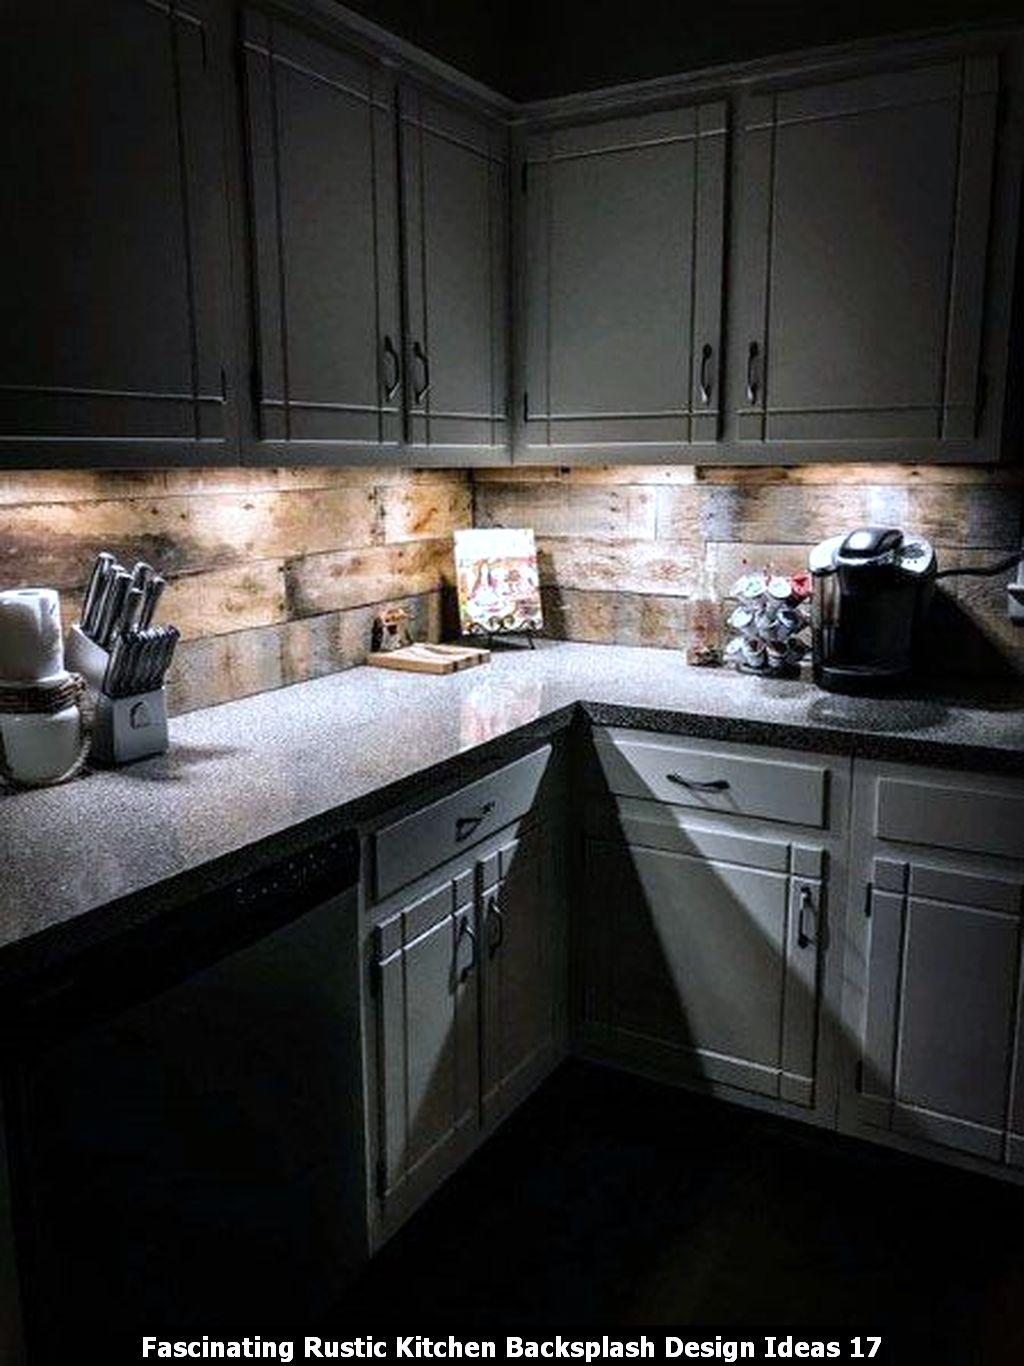 Fascinating Rustic Kitchen Backsplash Design Ideas 17